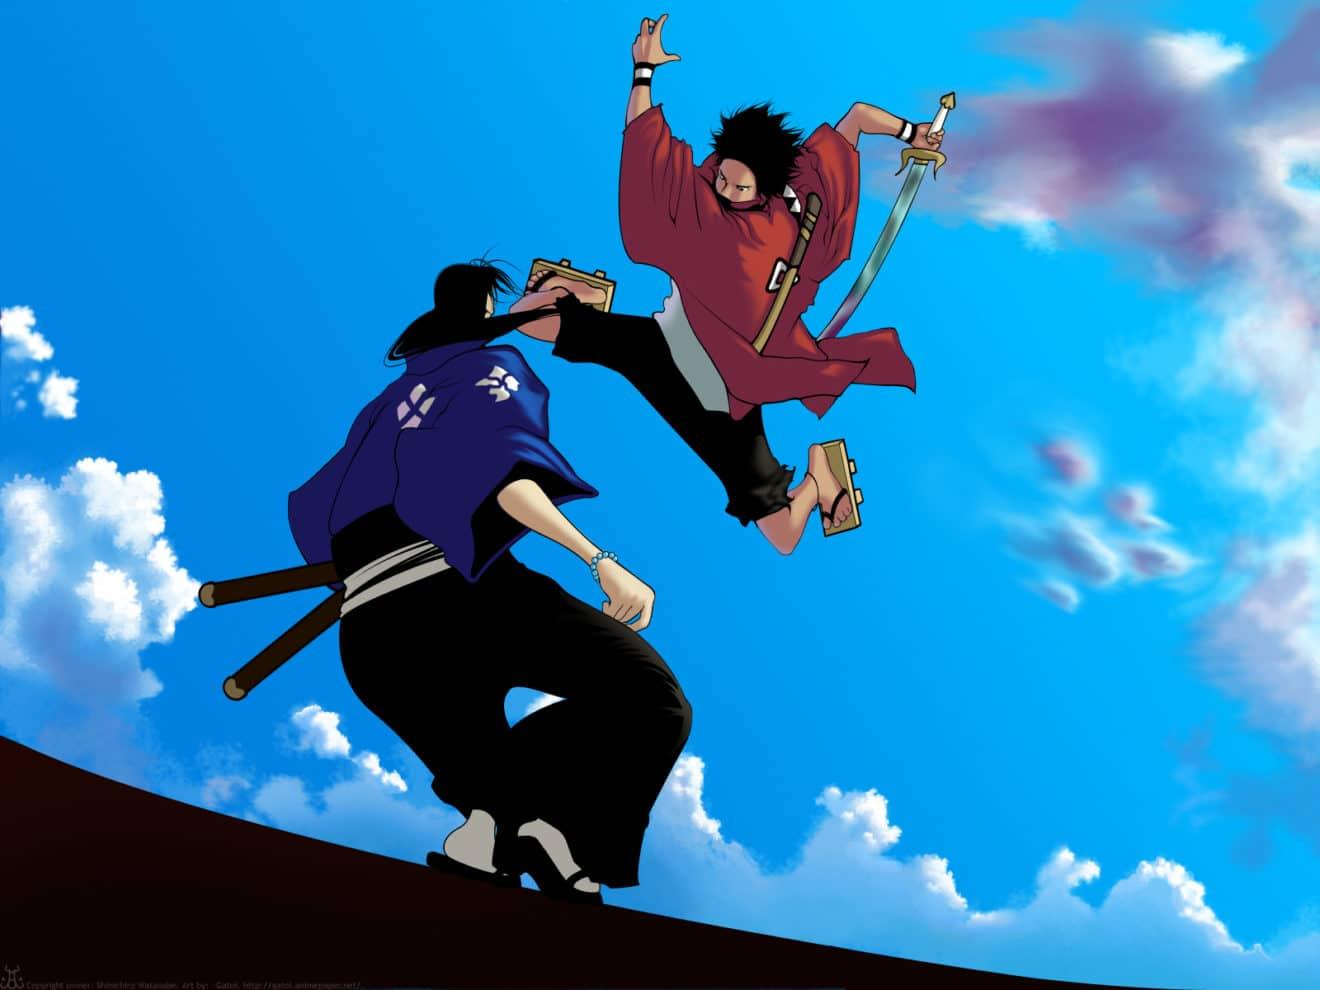 Pics Photos - Samurai Champloo Hd Wallpaper Of Anime Manga